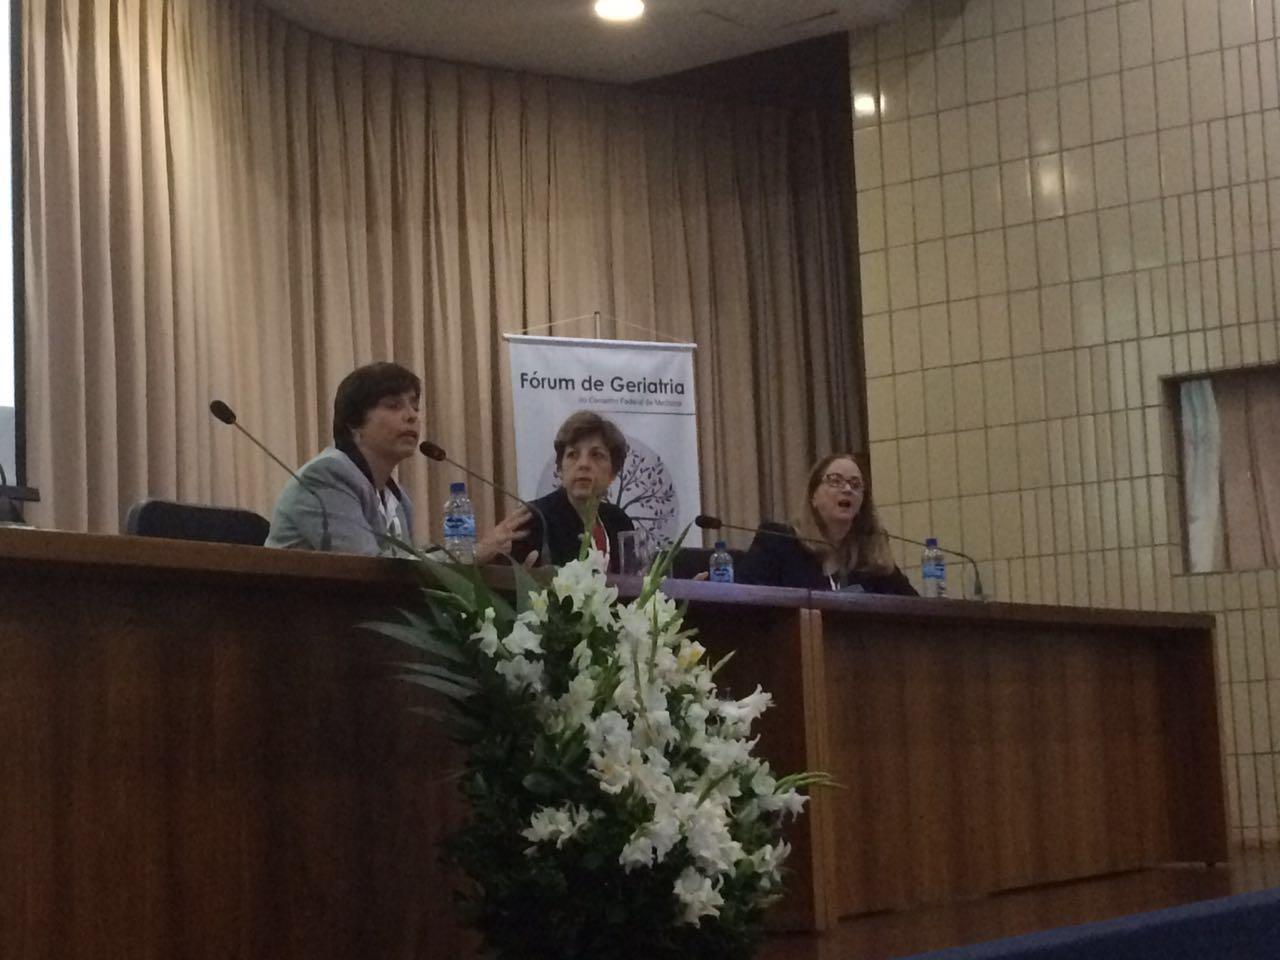 mesa_juridico Juiza Aglae, Claudia burla Nezilour lobato